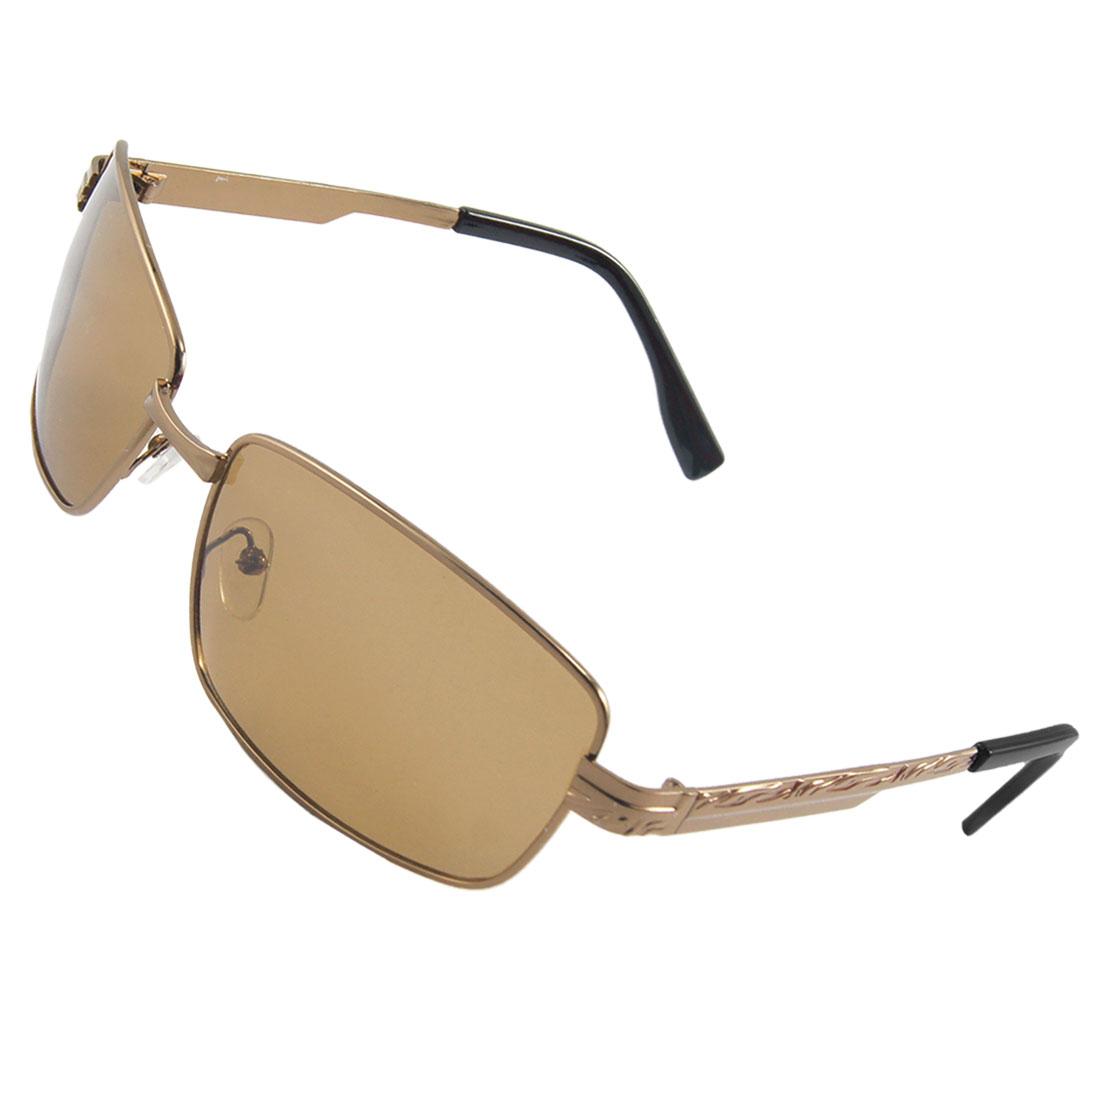 Unisex Rectangle Tawny Lens Metal Full Frame Sports Polarized Sunglasses